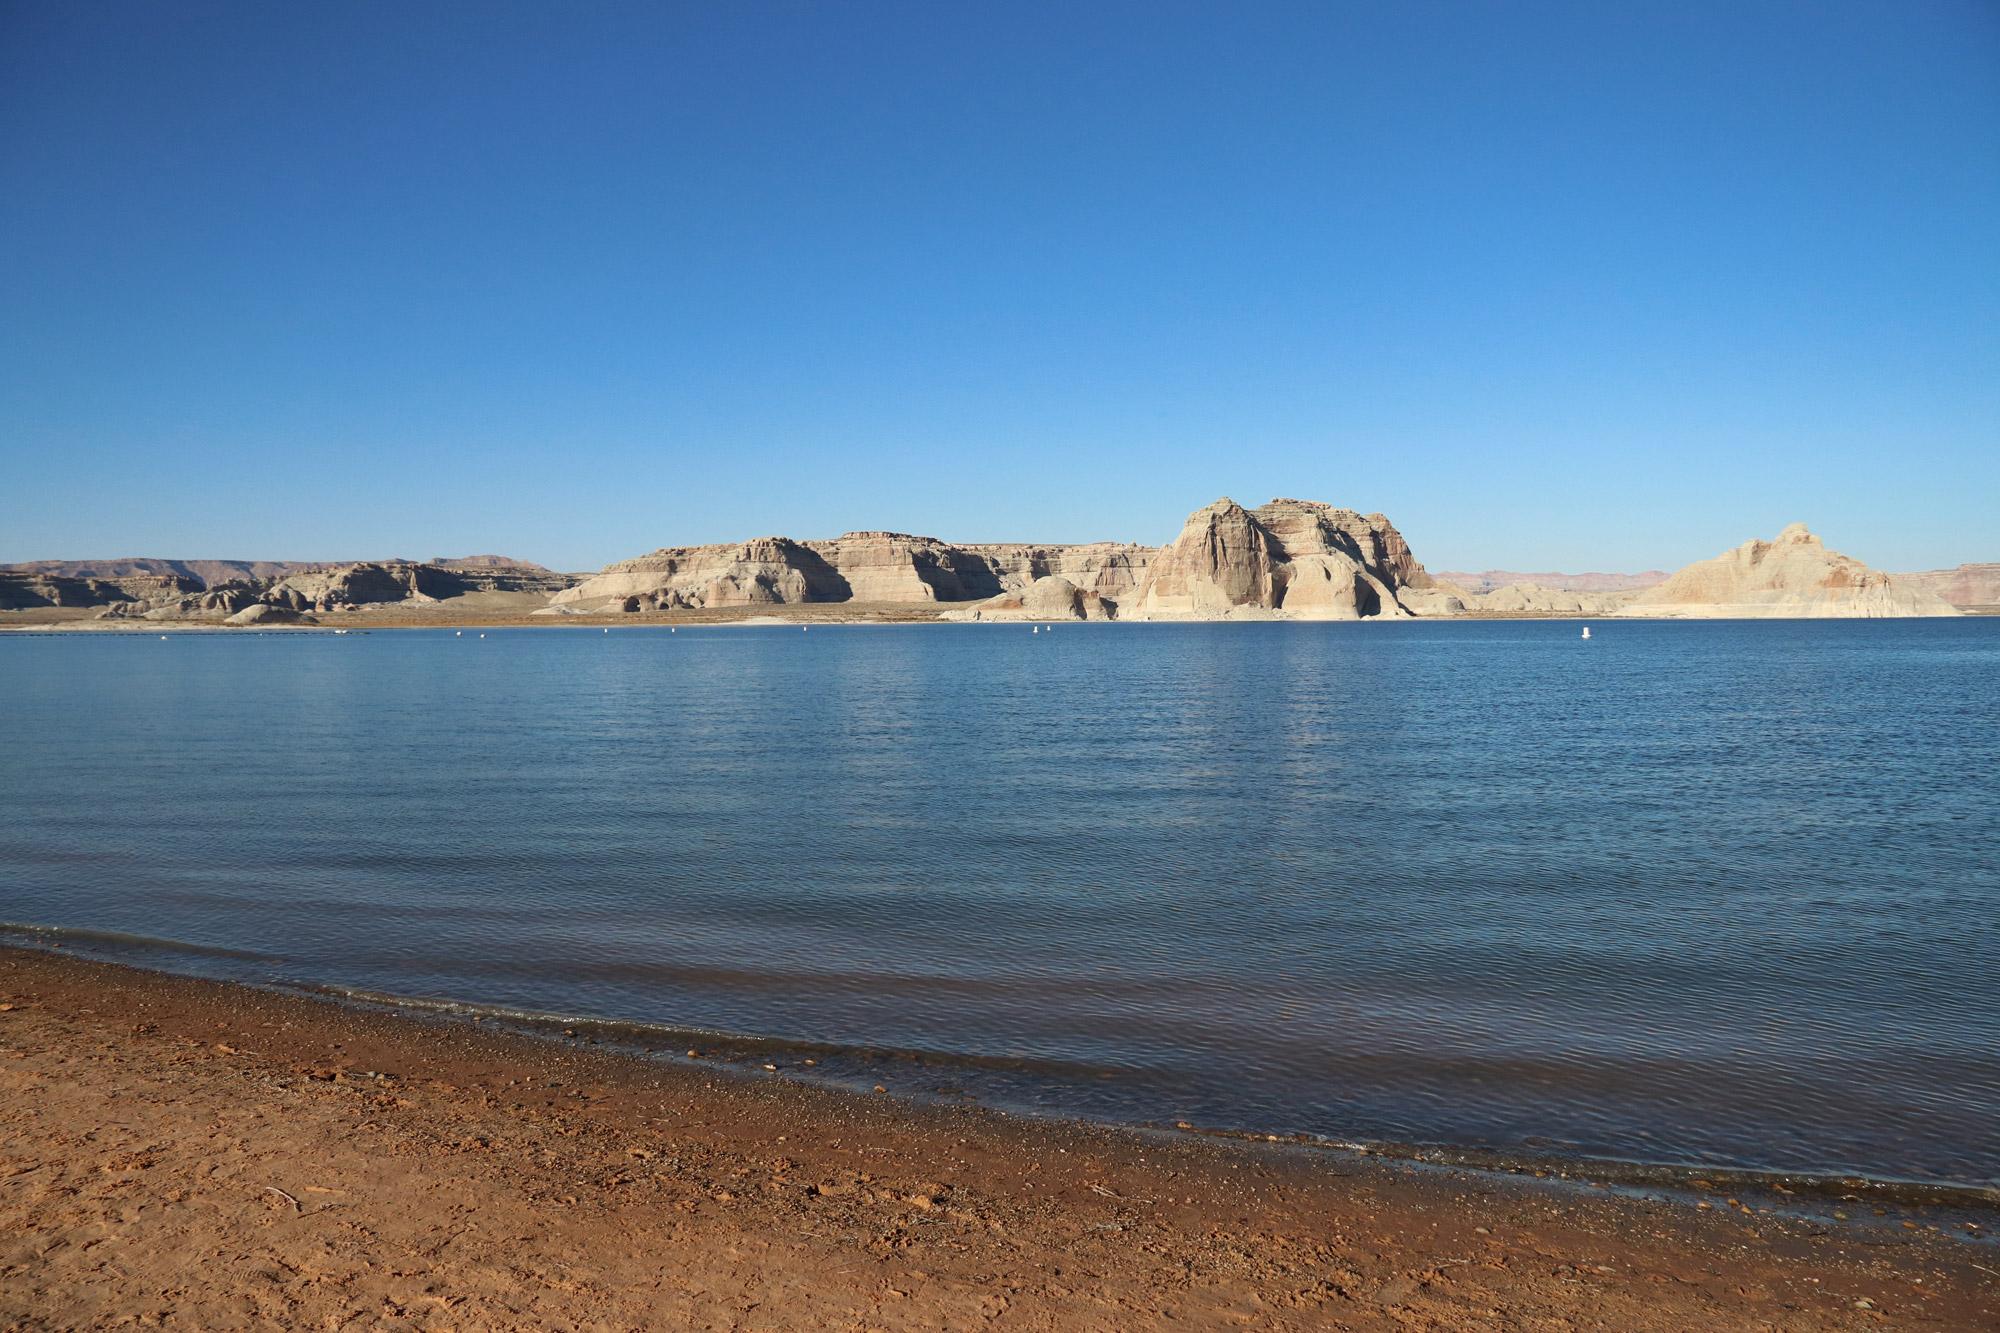 Amerika dag 11 - Lake Powell